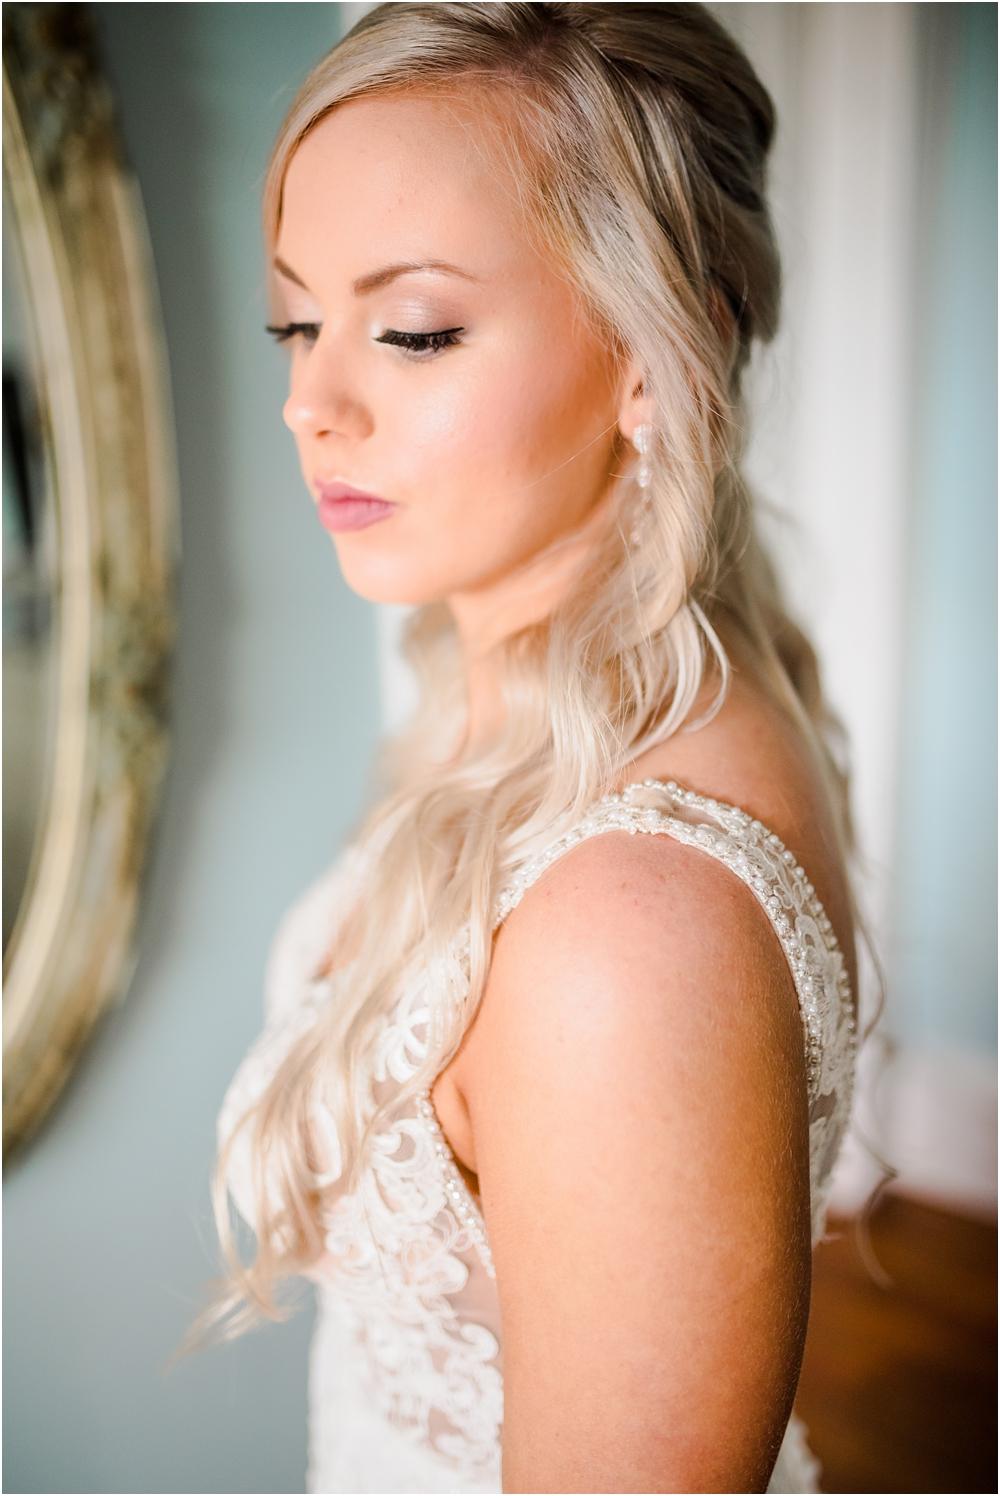 mcglothlin-wedding-kiersten-stevenson-photography-30a-panama-city-beach-dothan-tallahassee-(36-of-145).jpg